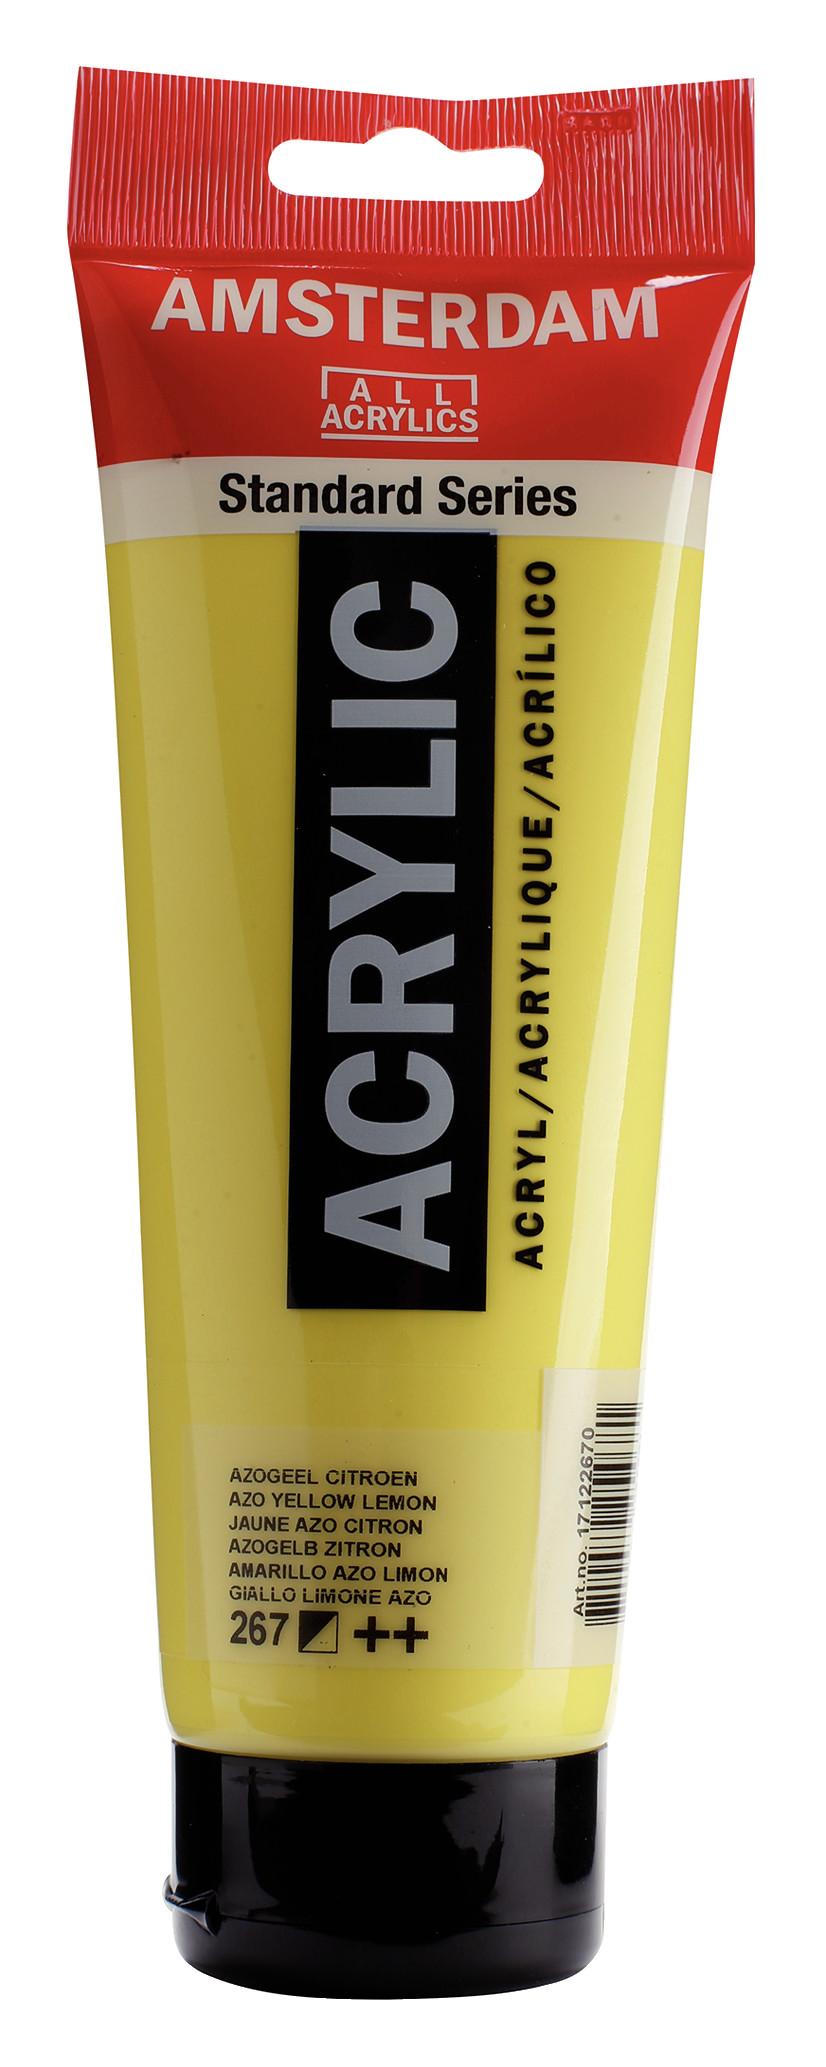 Amsterdam Standard Series Acrylic Tube 250 ml Azo yellow lemon 267